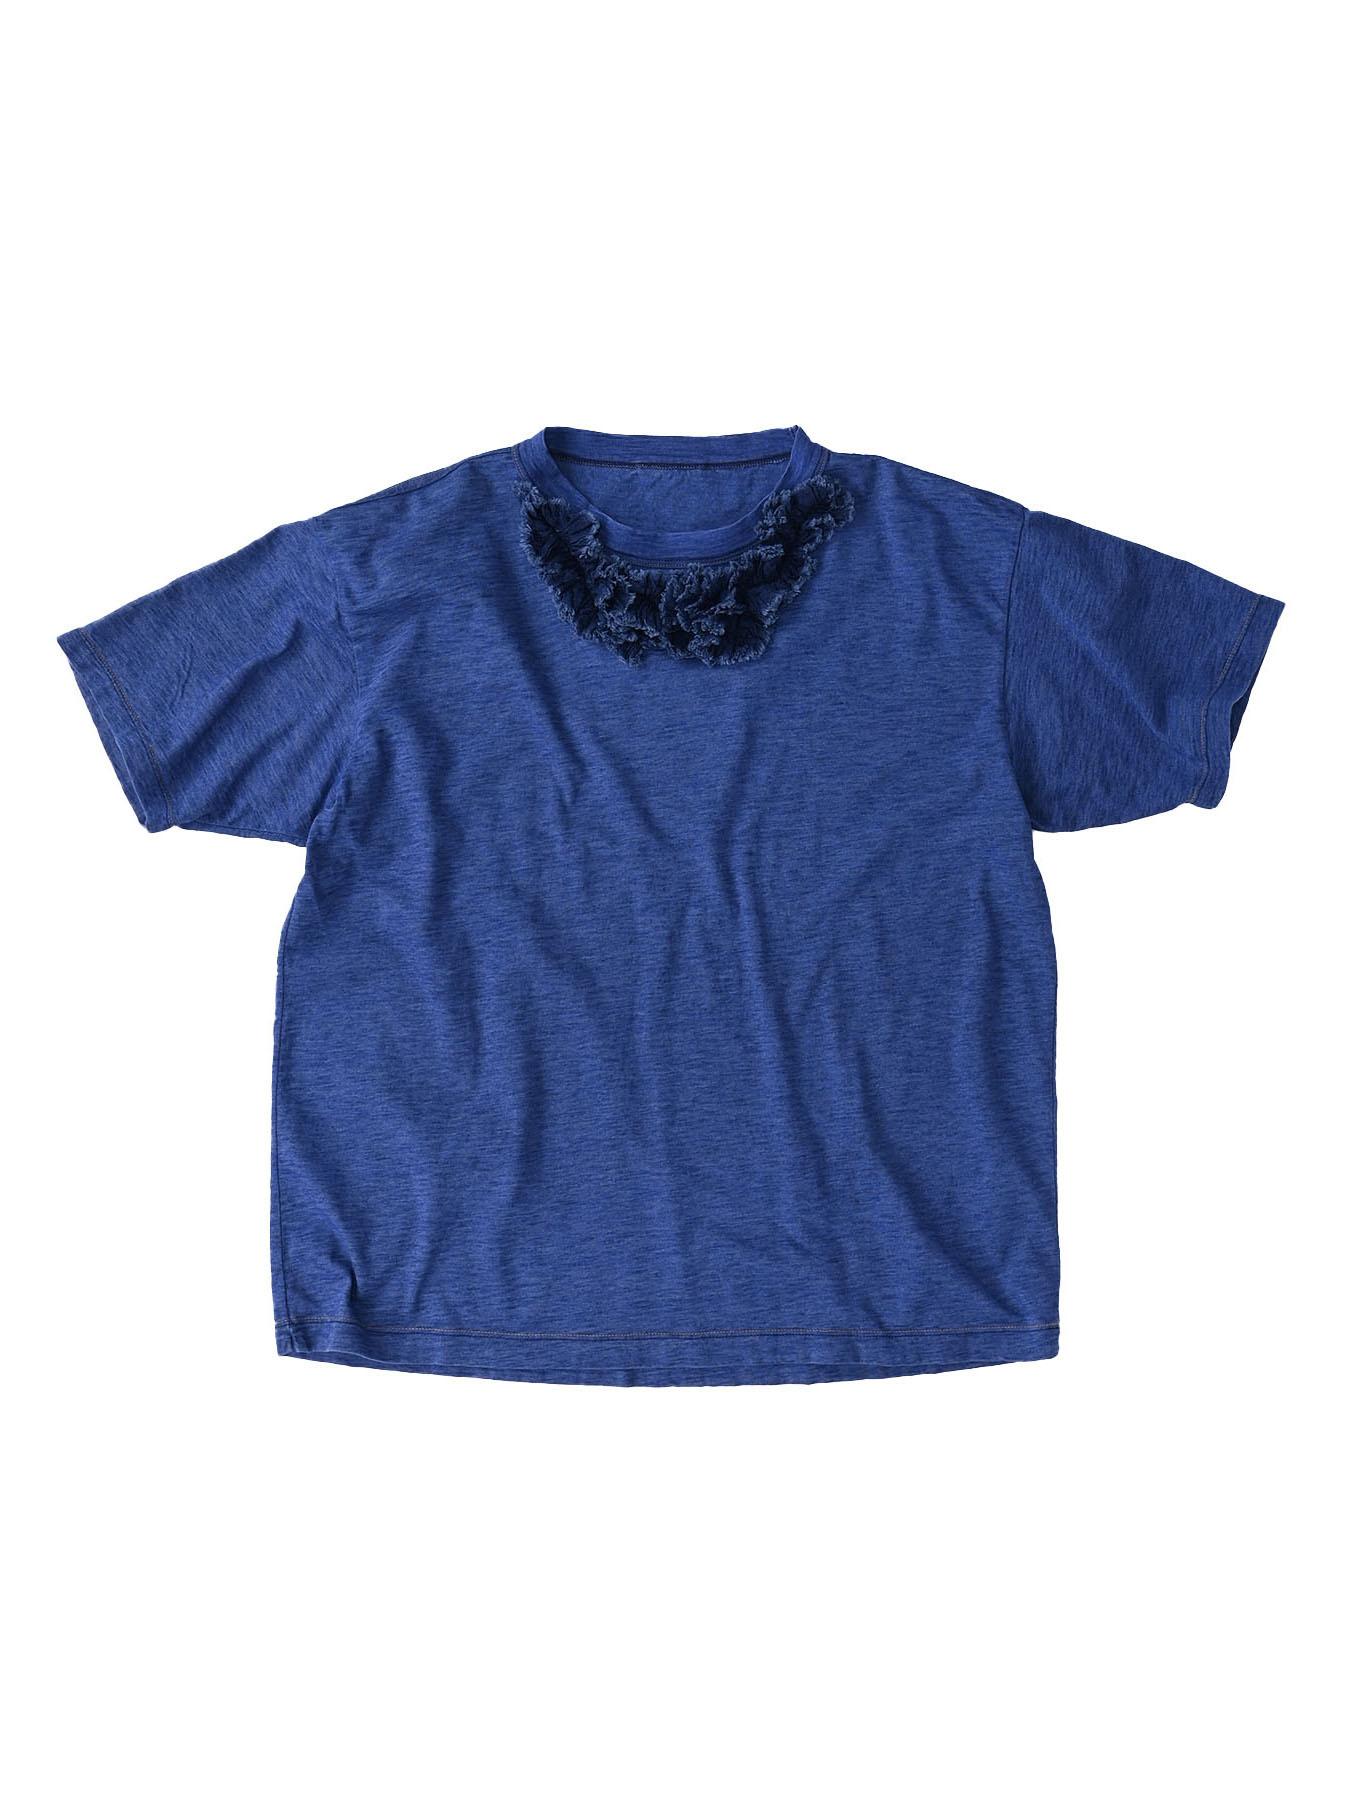 Indigo Tenjiku Lei Frill Ocean T-shirt (0621)-1